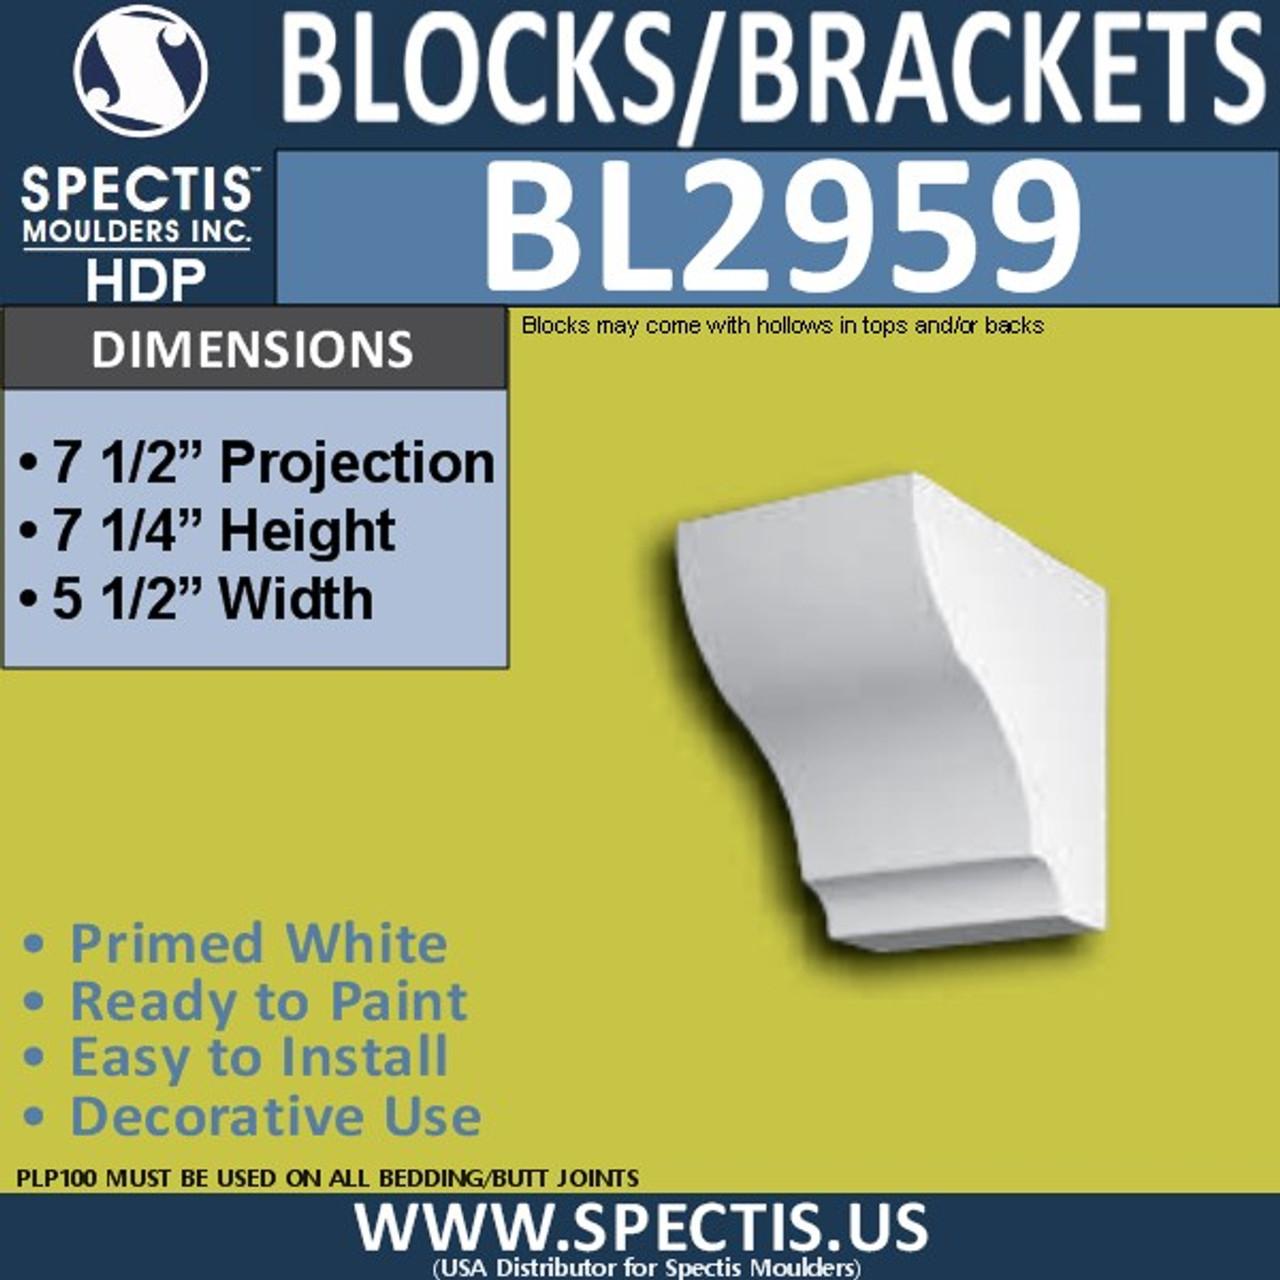 "BL2959 Eave Block or Bracket 5.5""W x 7.25""H x 7.5"" P"